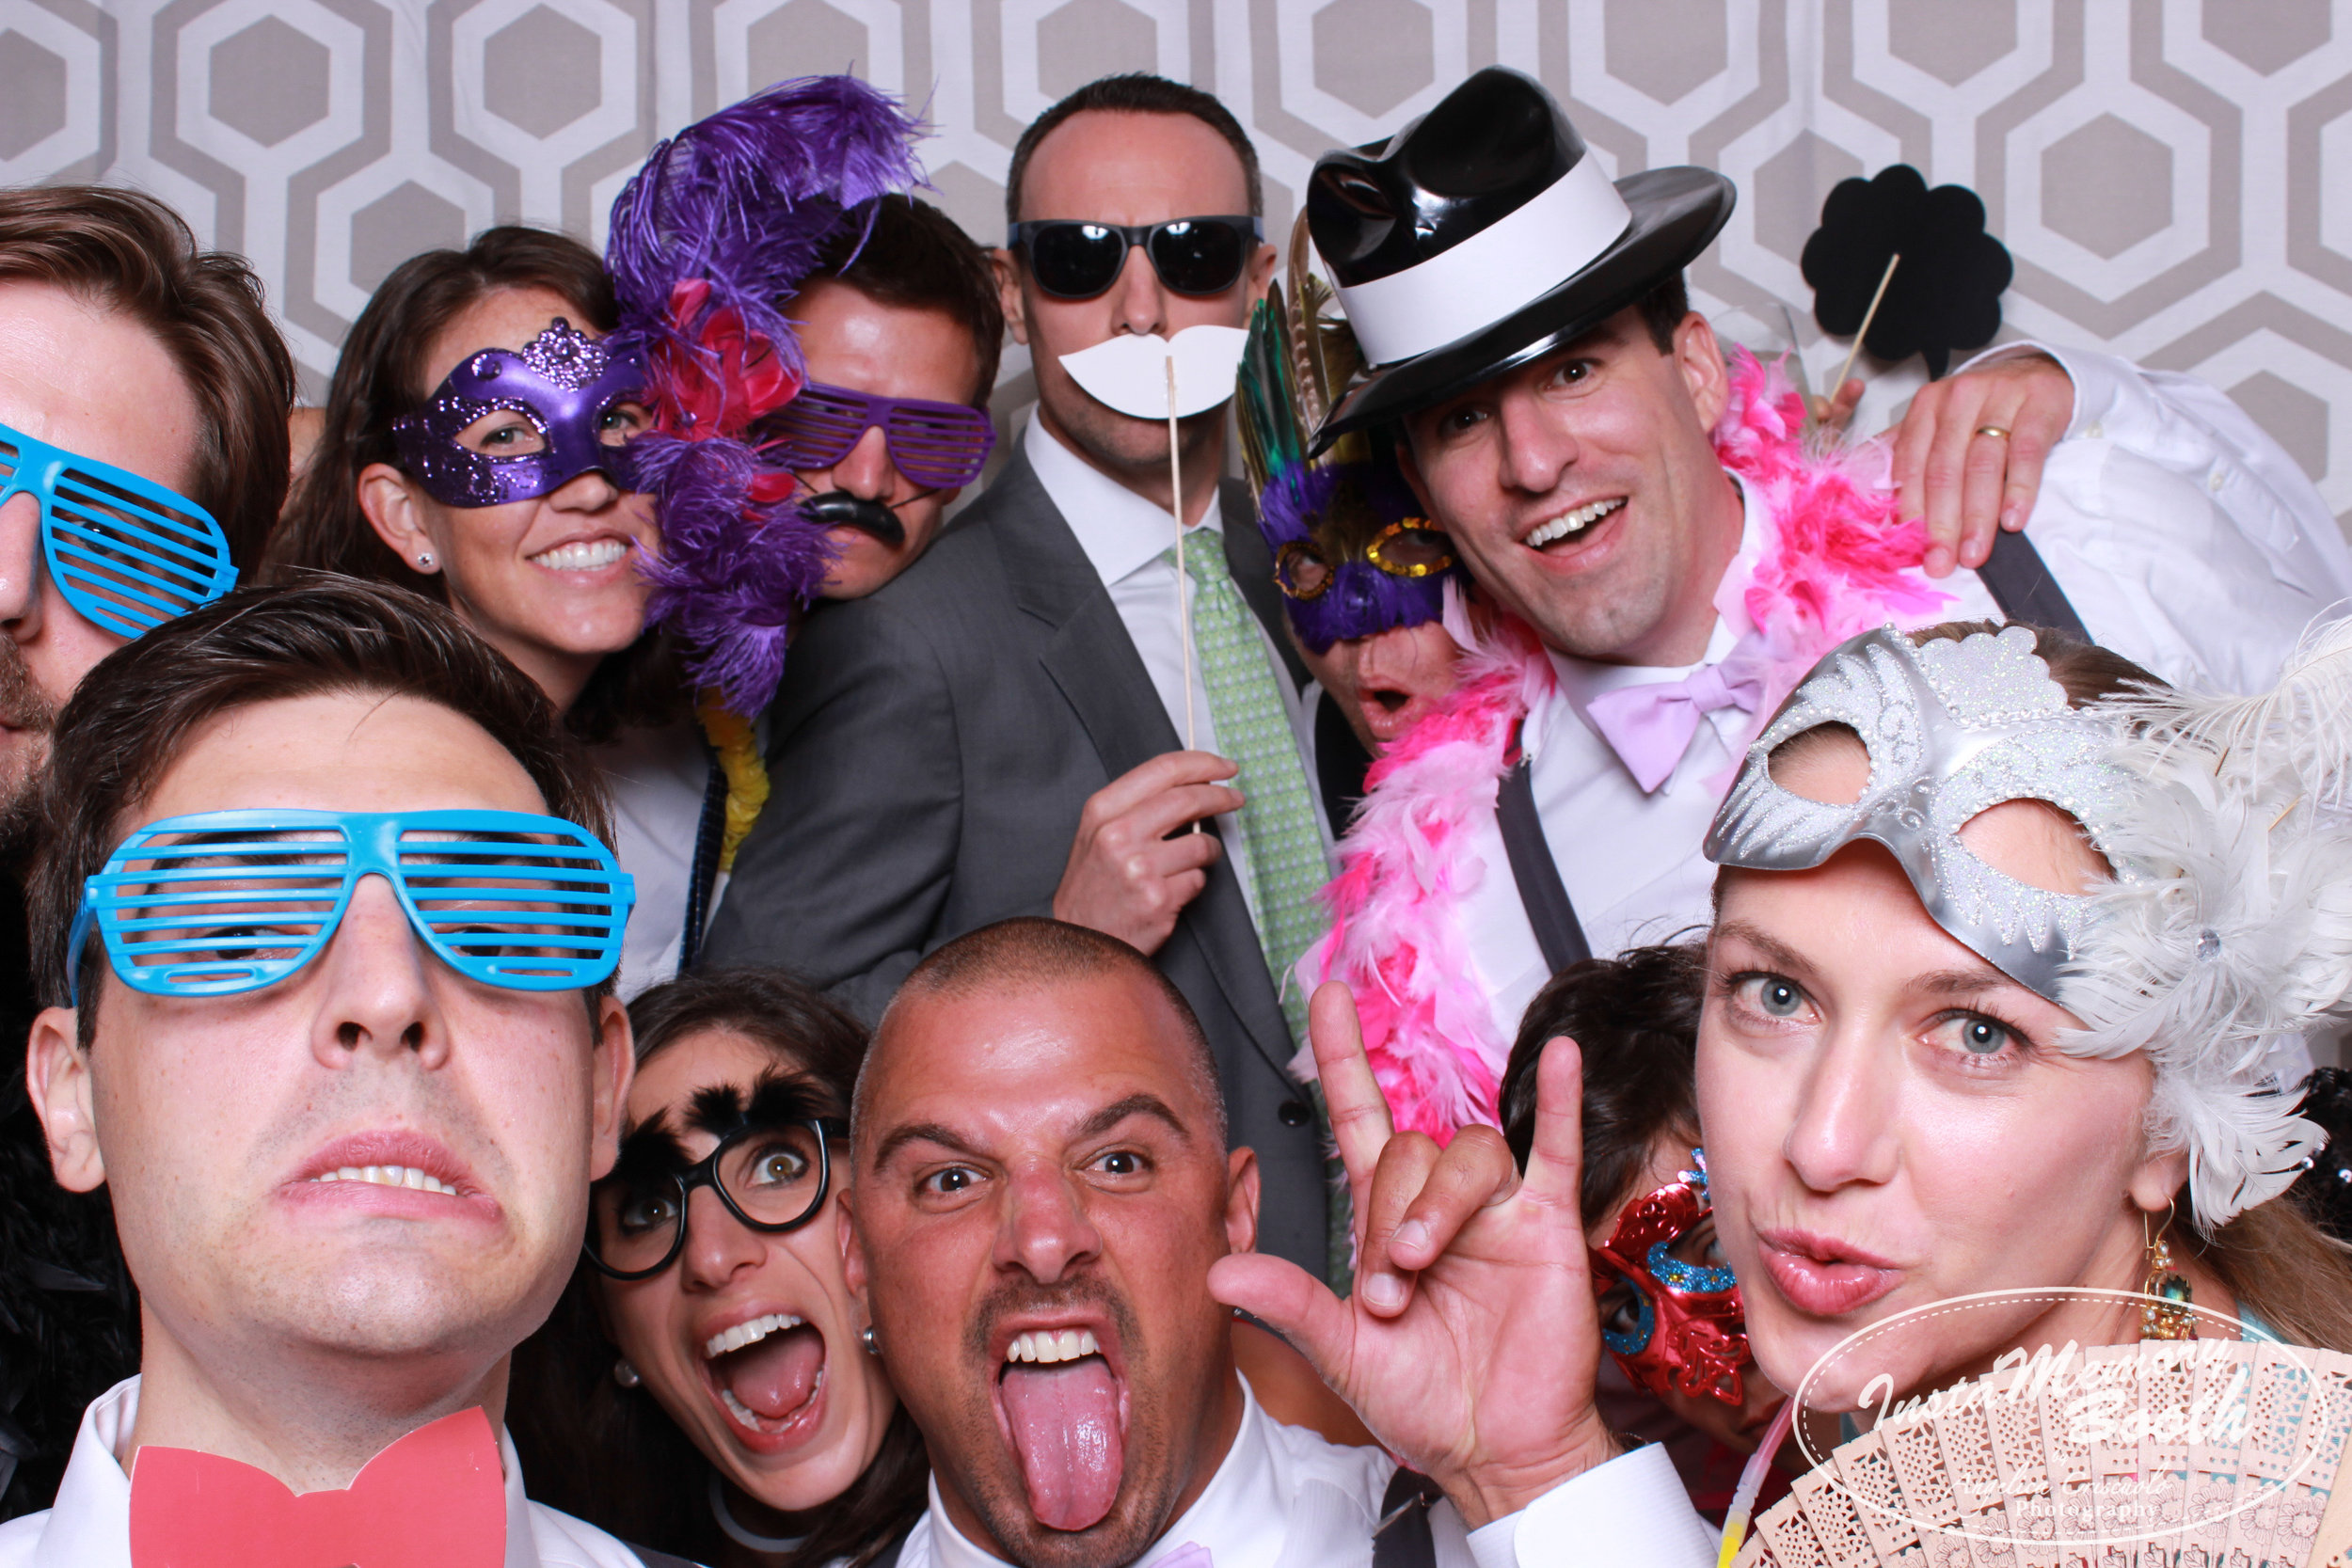 NYC_NJ_CT_Photobooth_rental_Weddings_corporate_auctions_galas-226.jpg